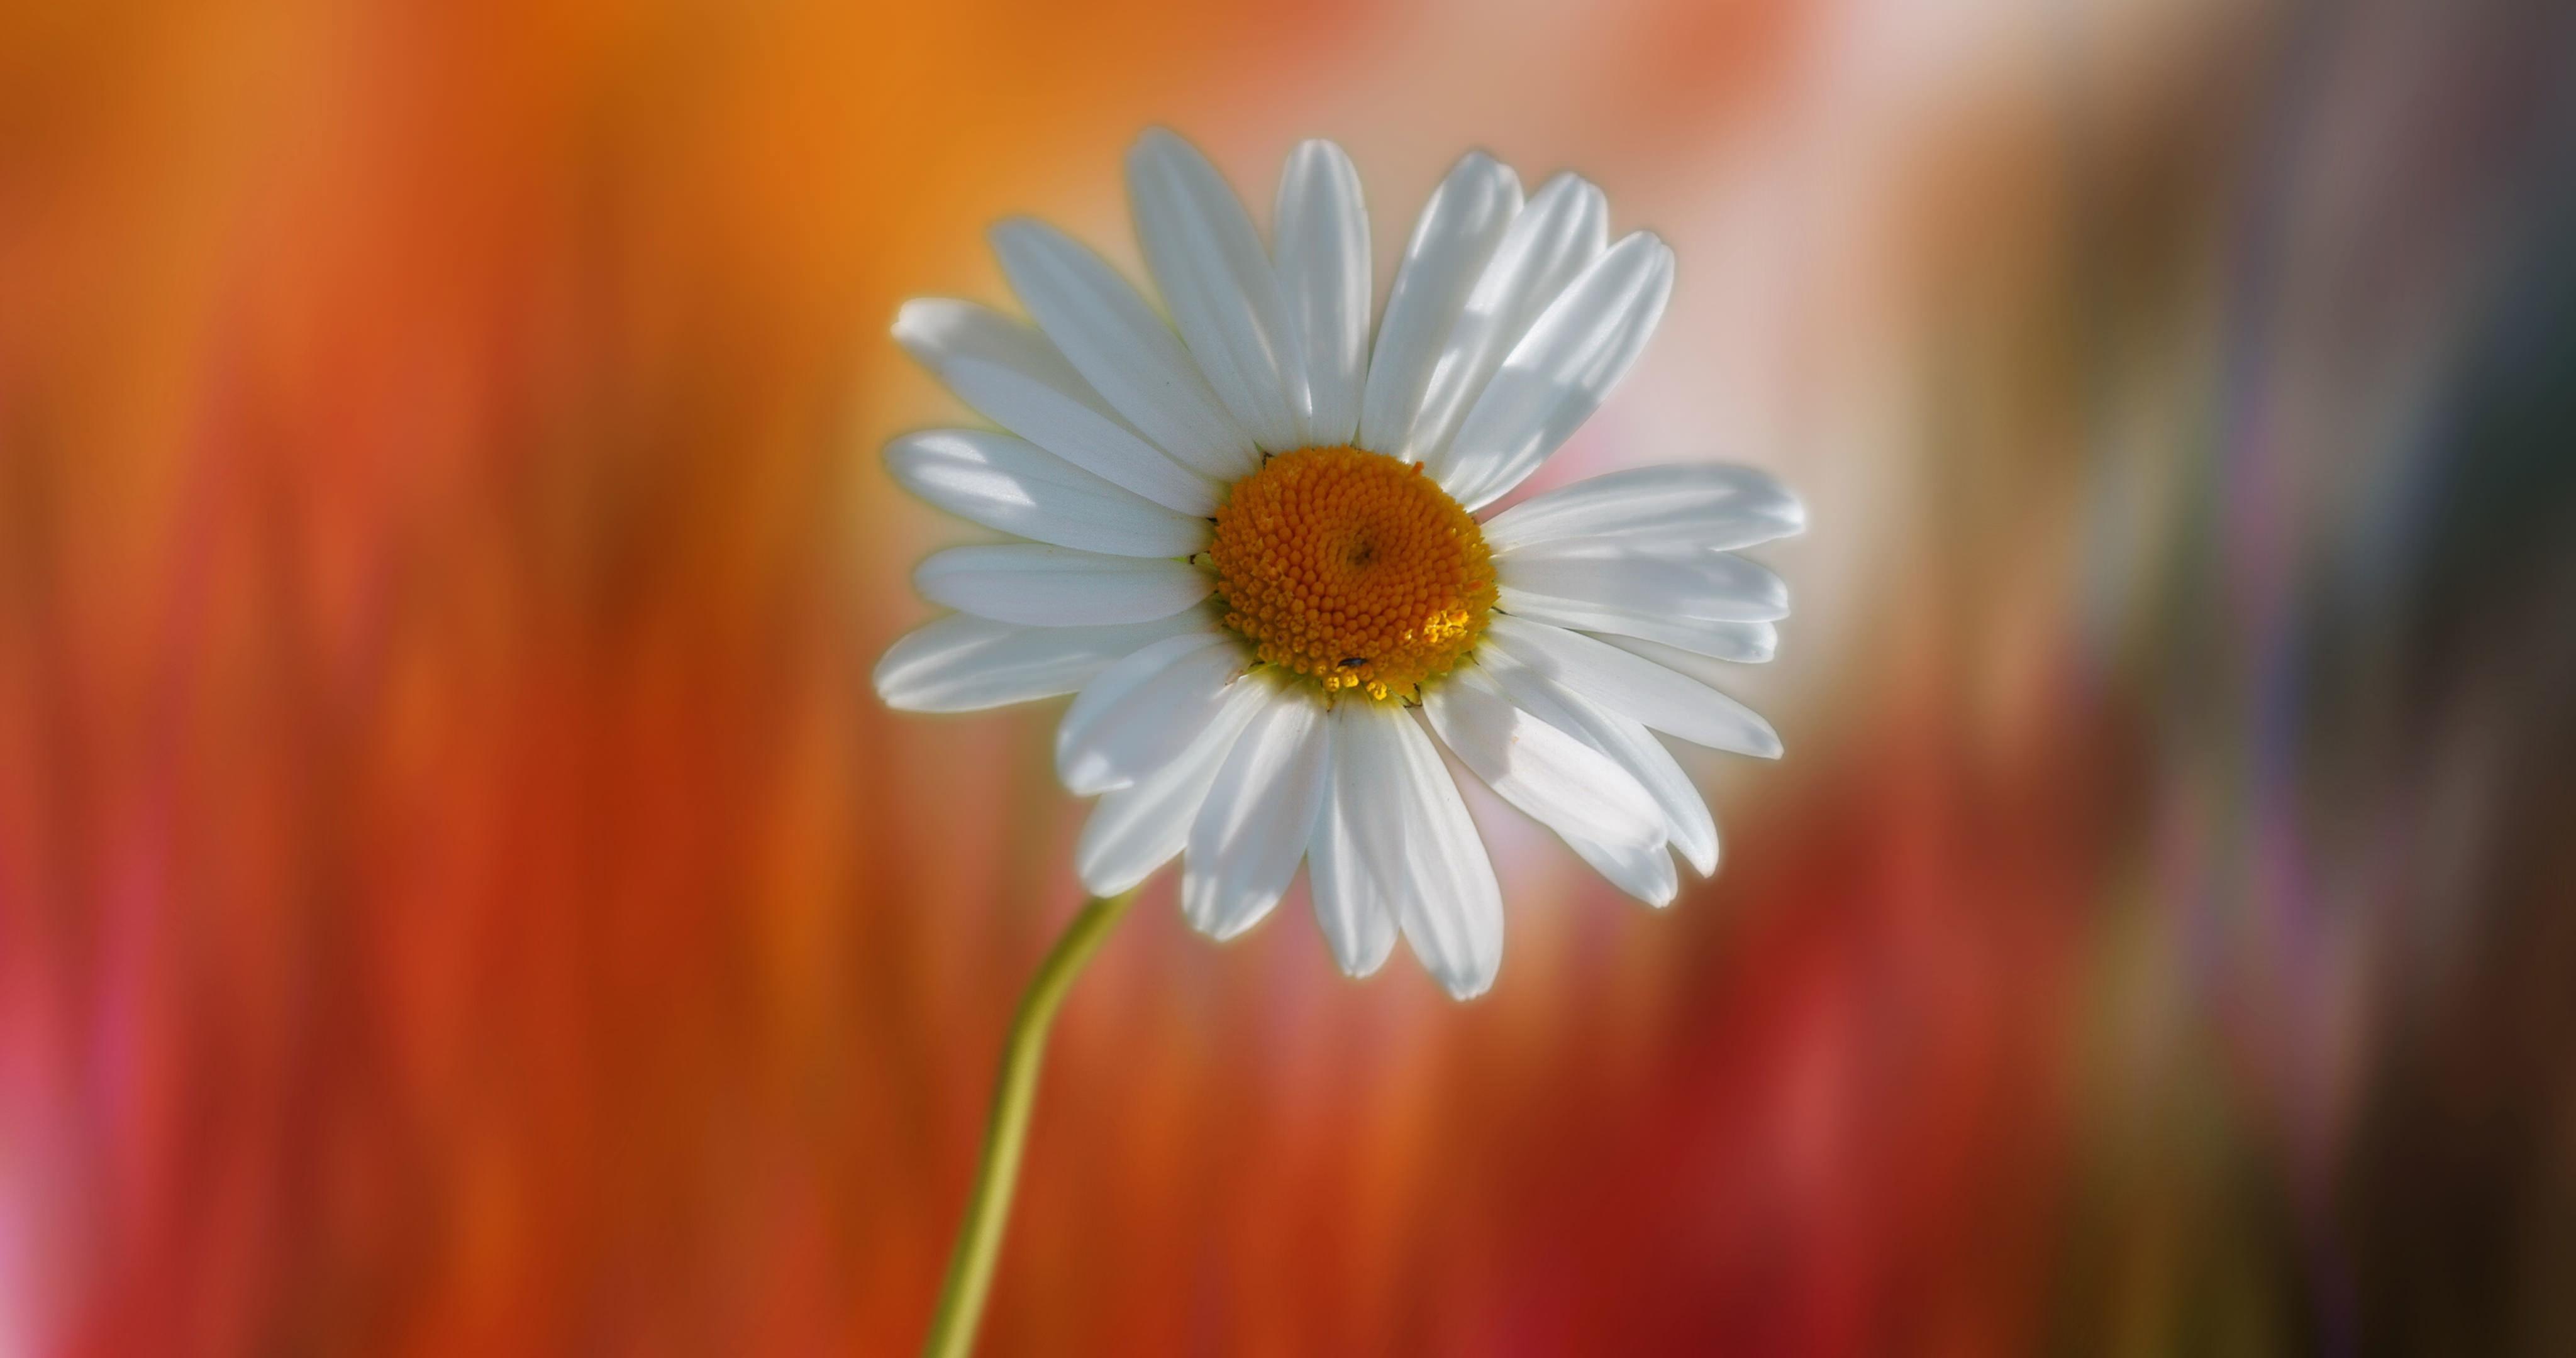 hinh anh hoa cuc dep 72